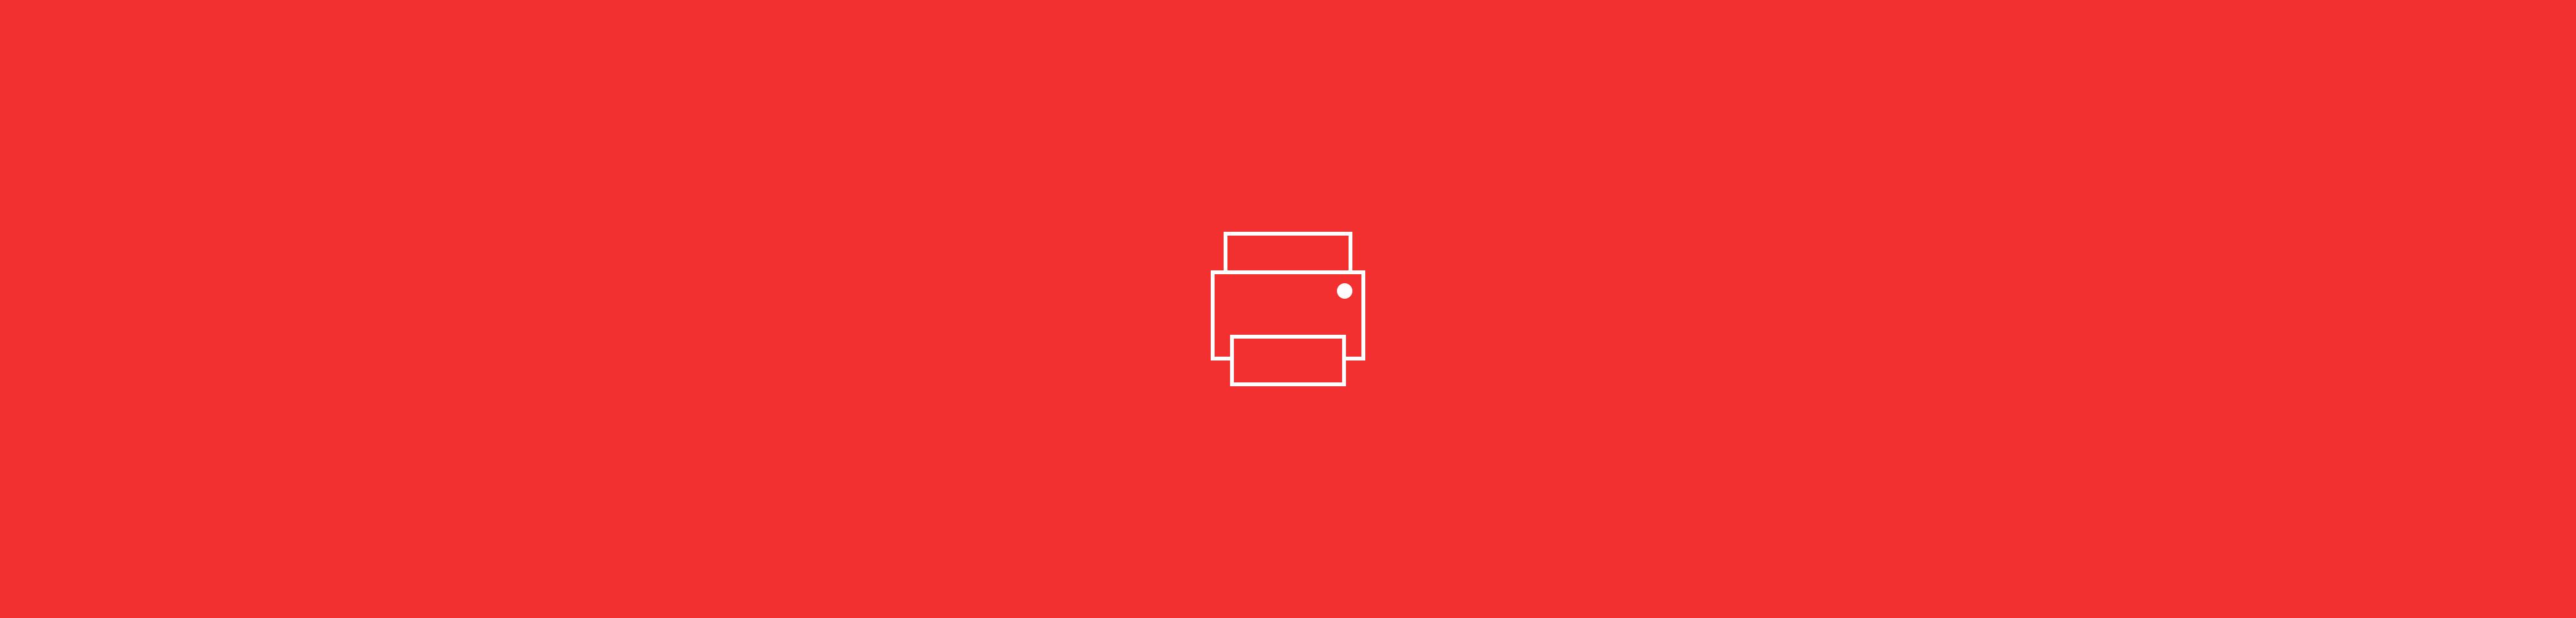 pdf printer free online tool to print to pdf